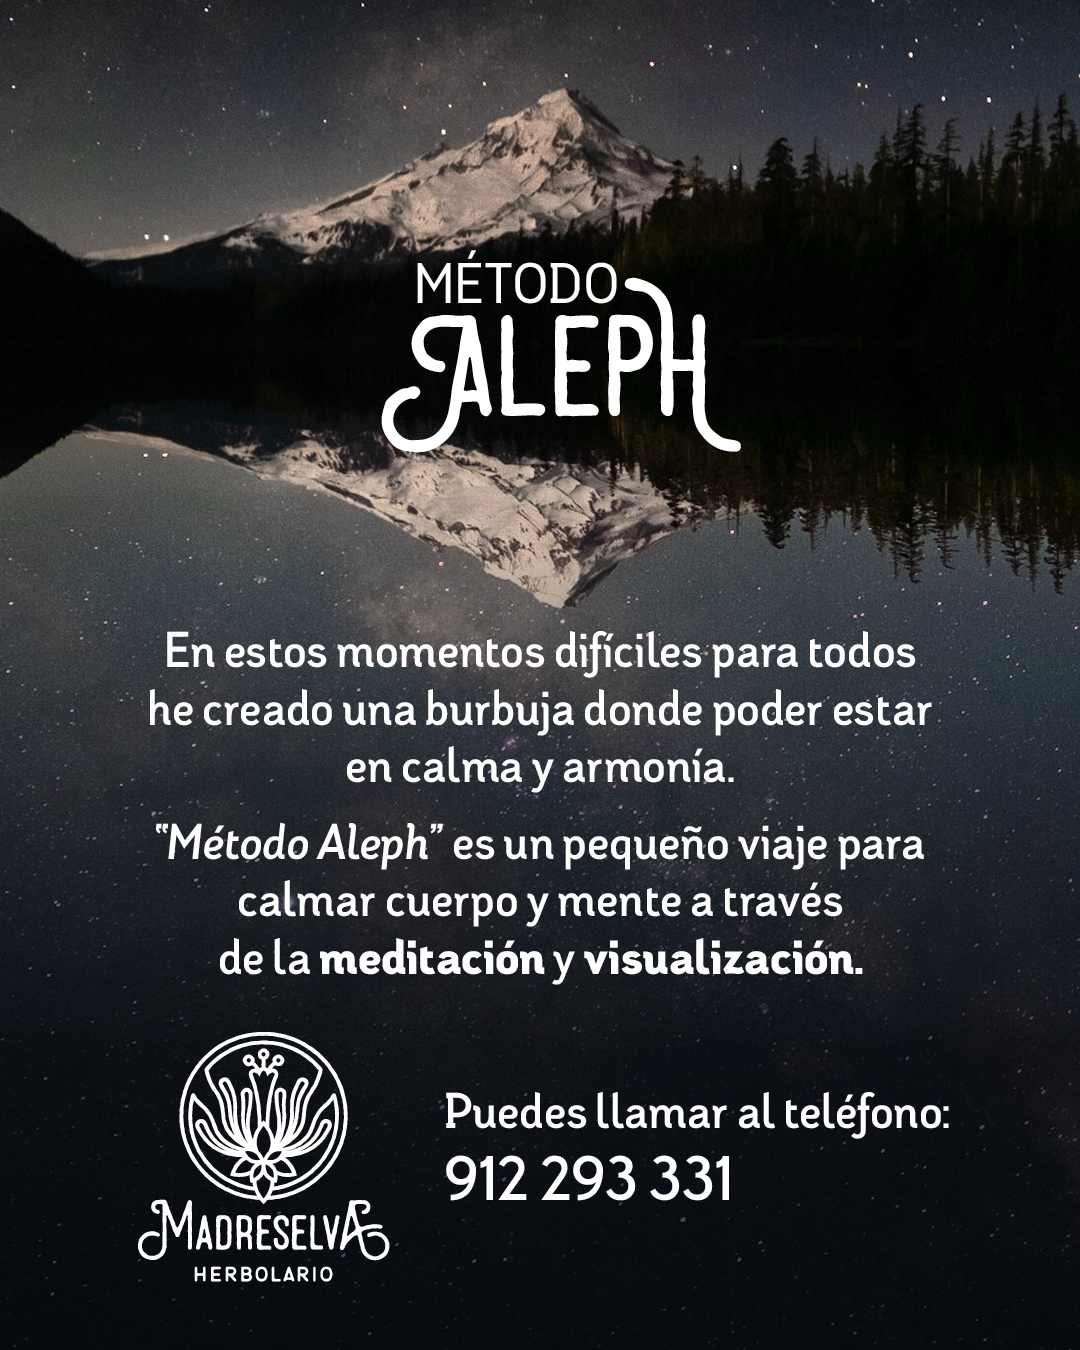 Método Alpeh